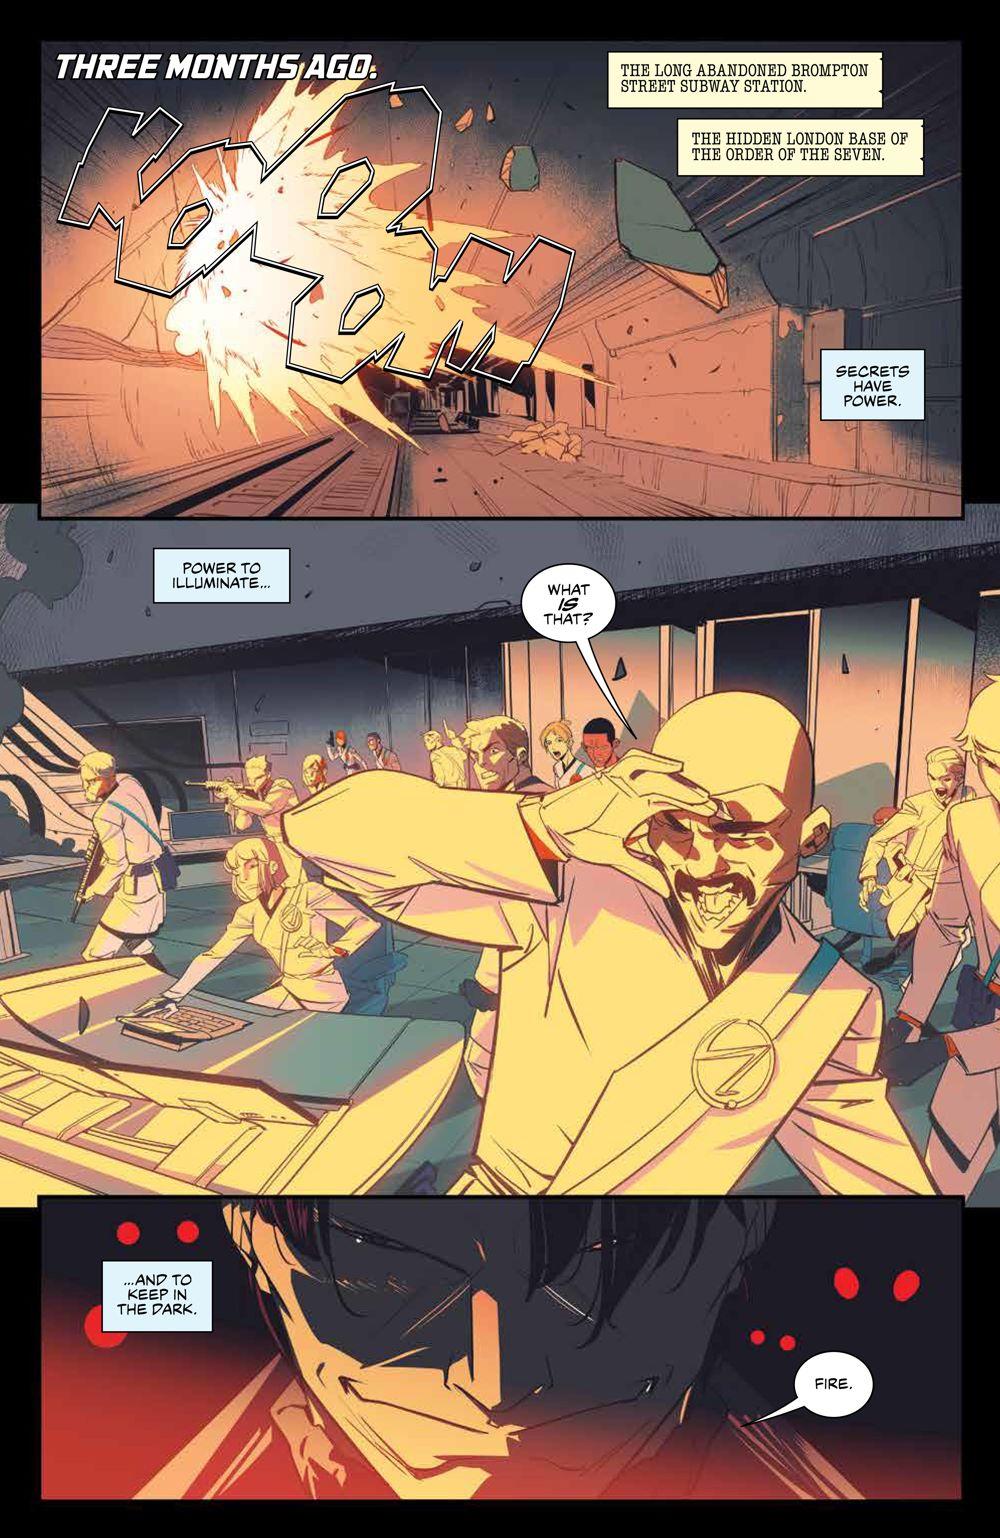 SevenSecrets_v1_SC_PRESS_10 ComicList Previews: SEVEN SECRETS VOLUME 1 TP